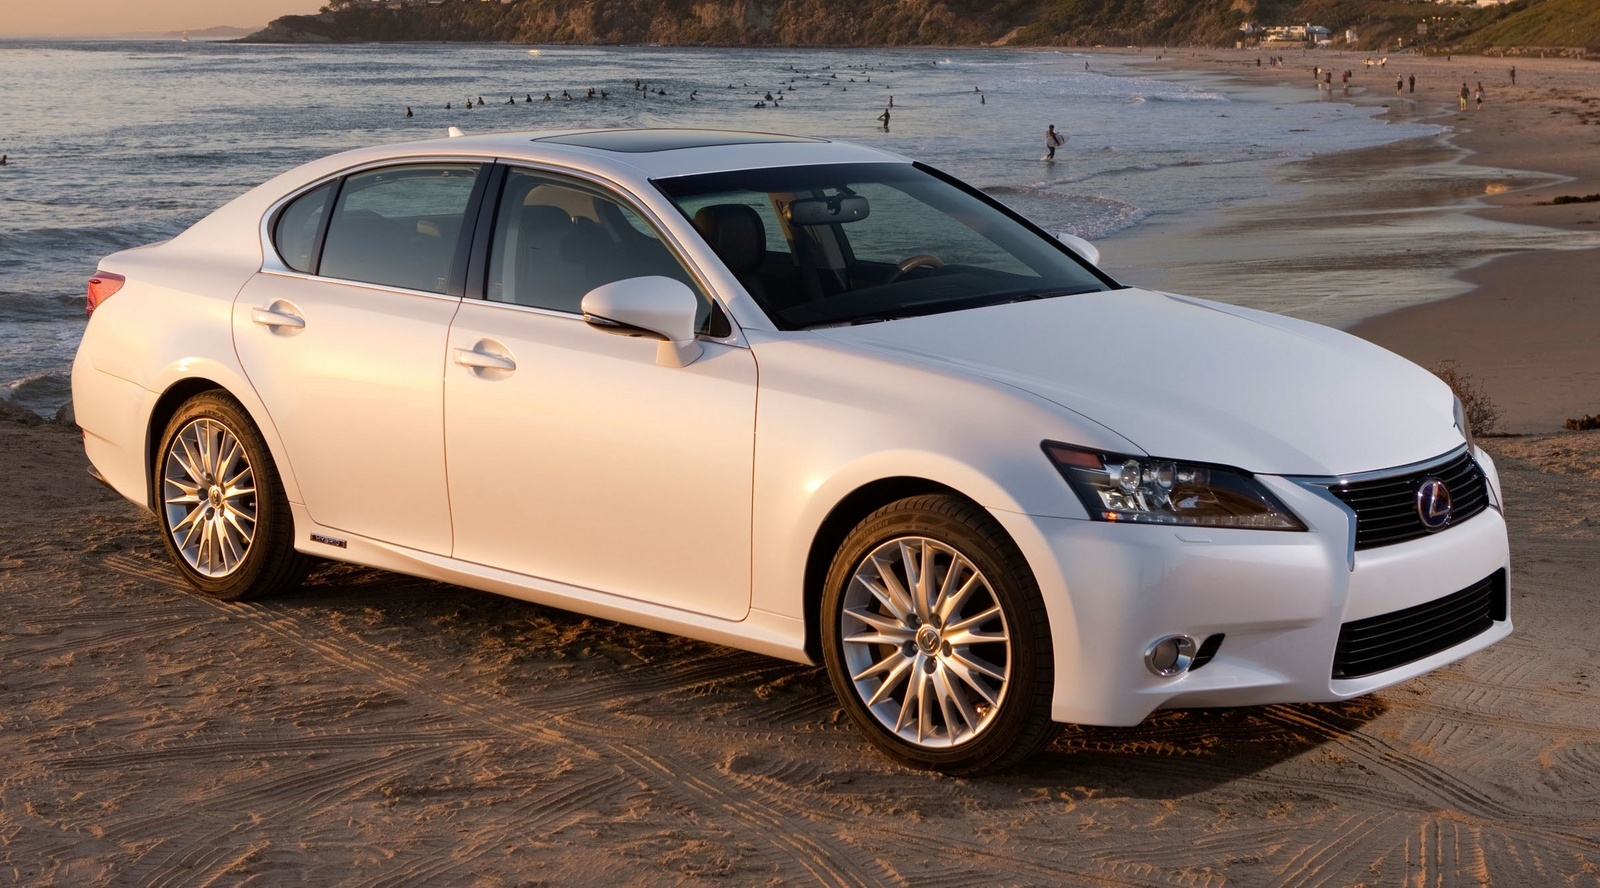 2015 Lexus GS Hybrid - Overview - CarGurus